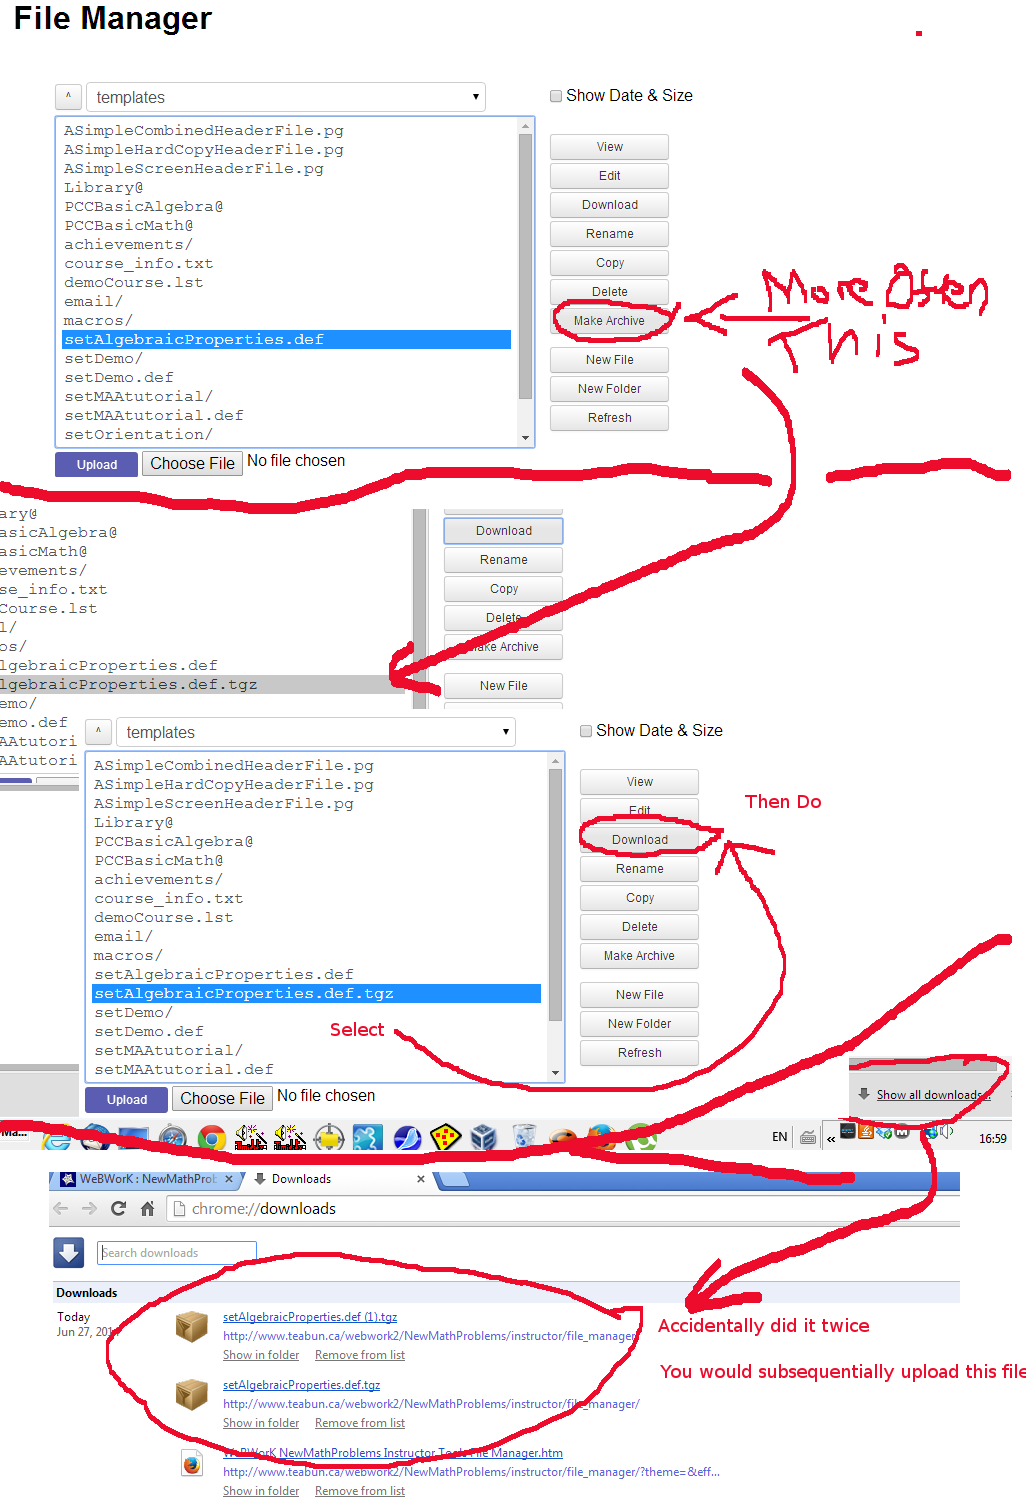 Attachment downloadProblem2.png